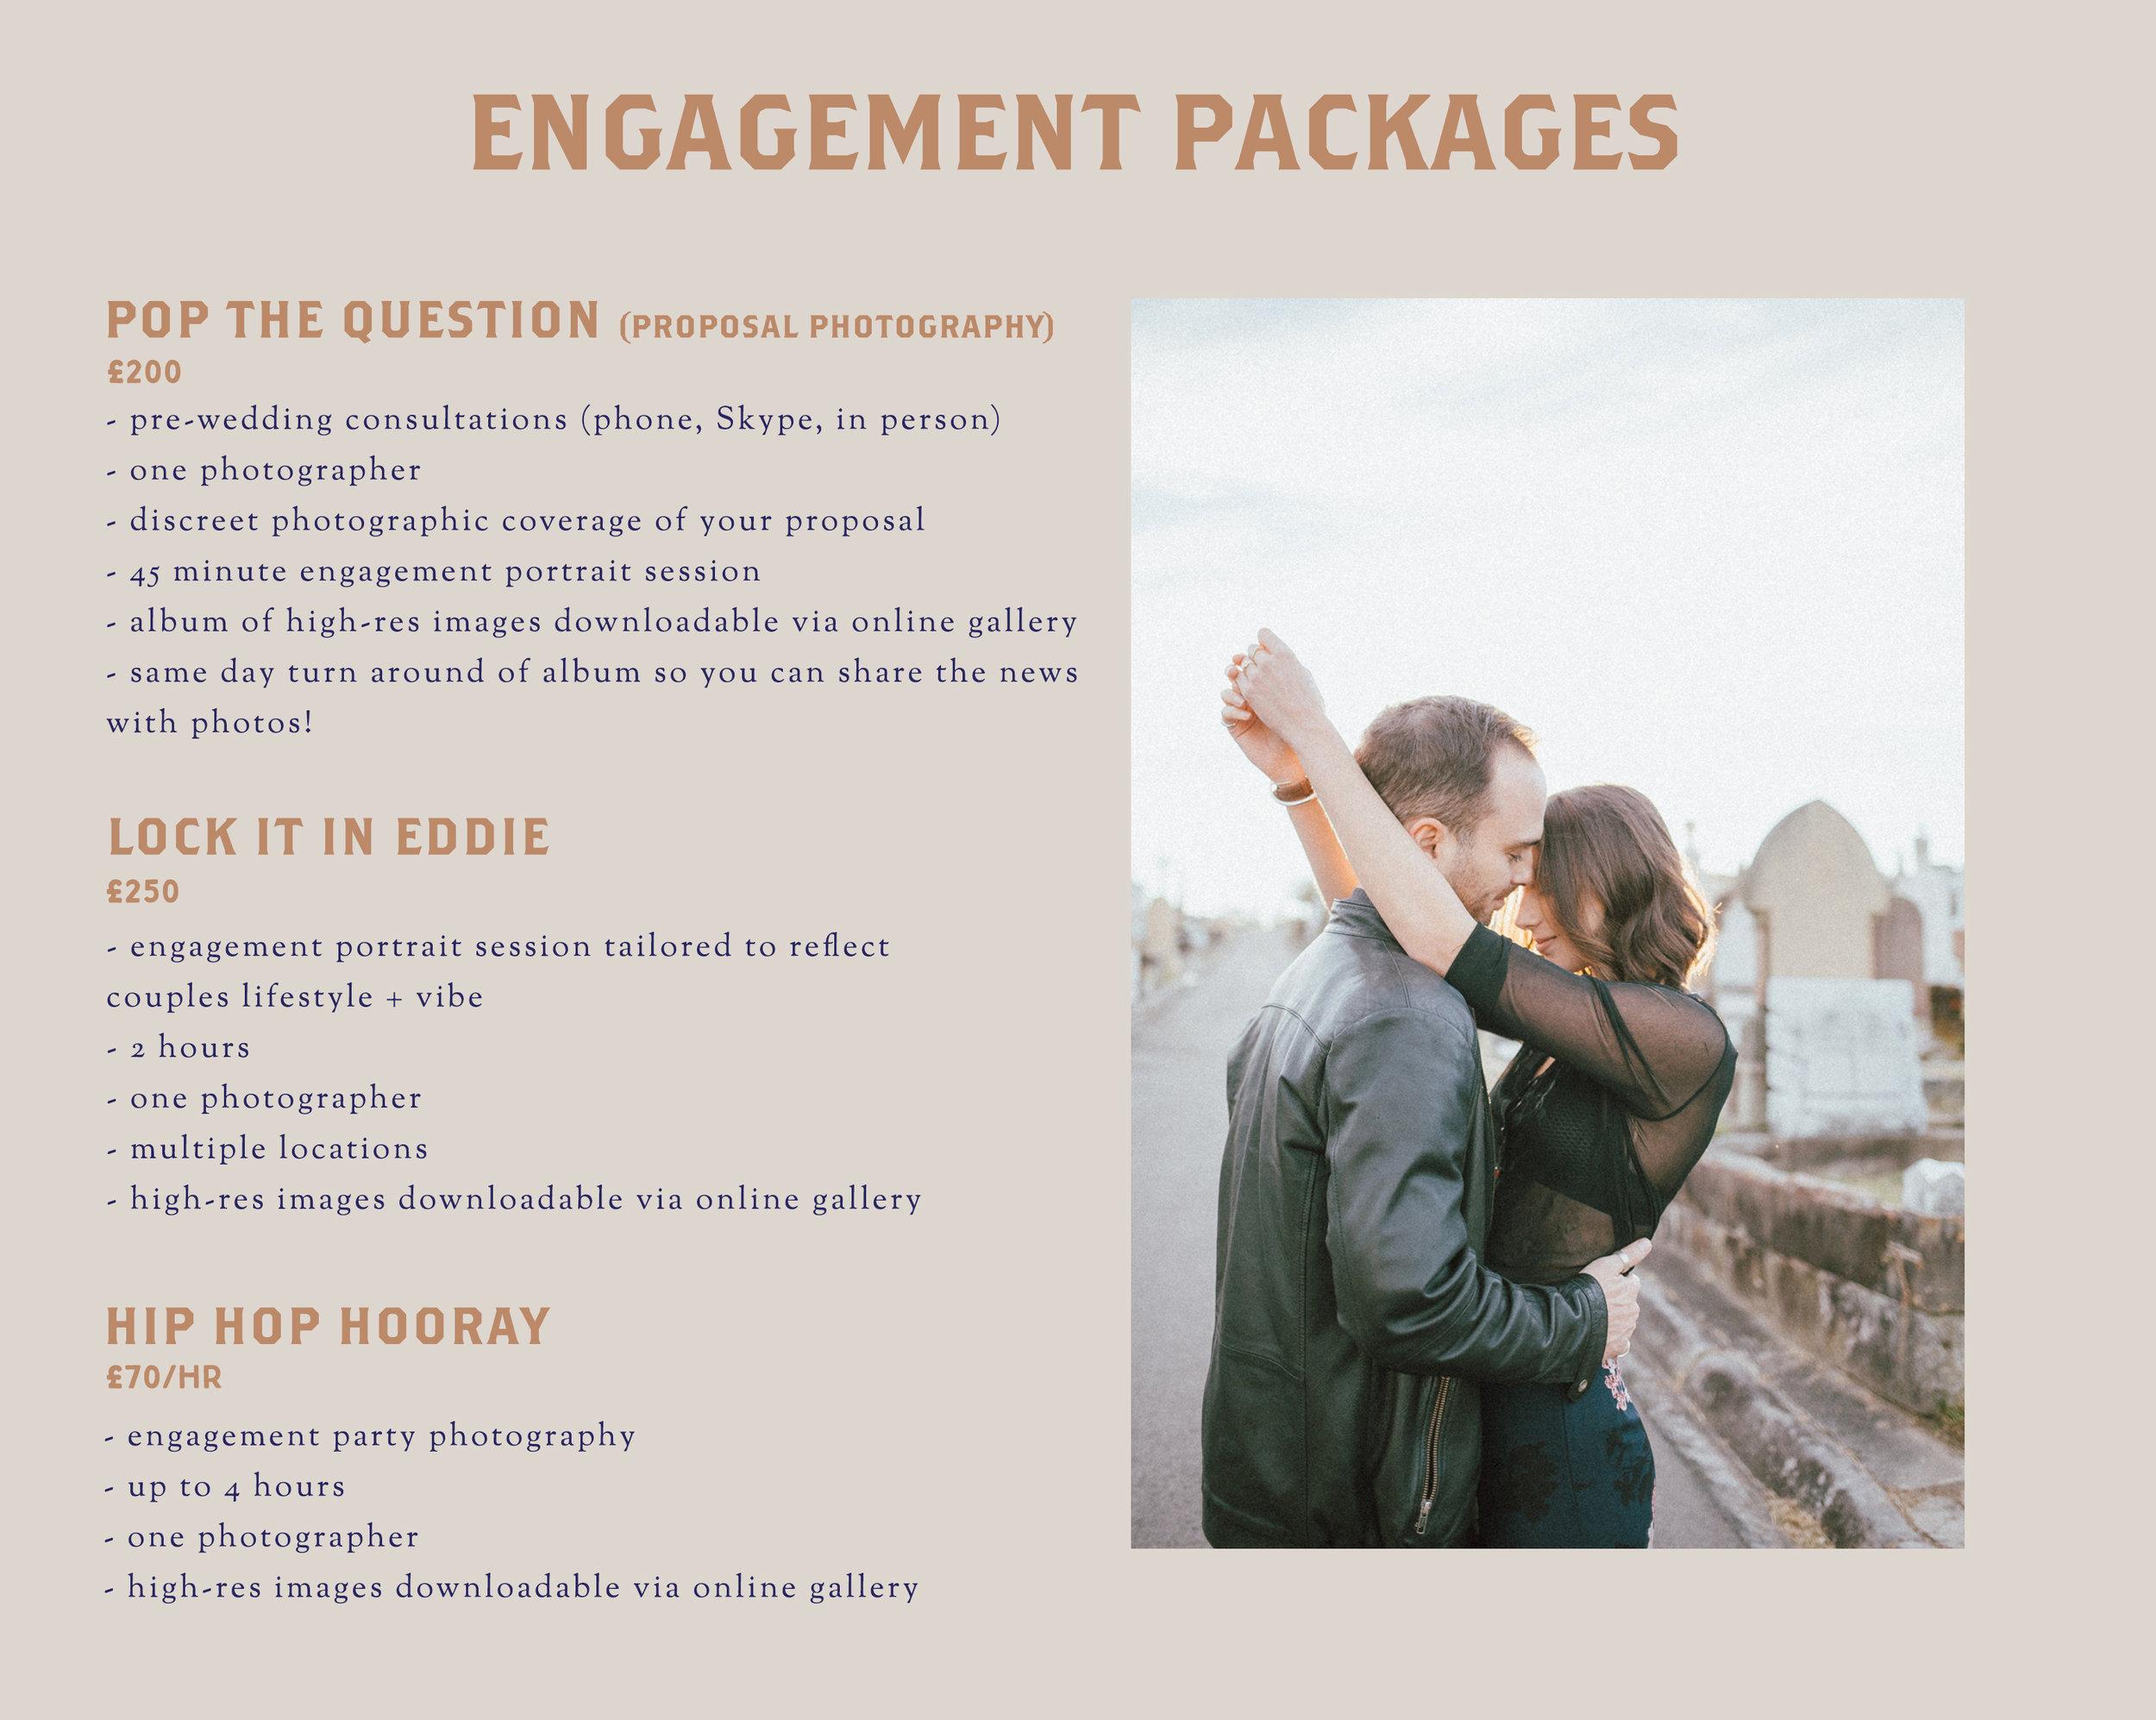 UK engagement packages.jpg